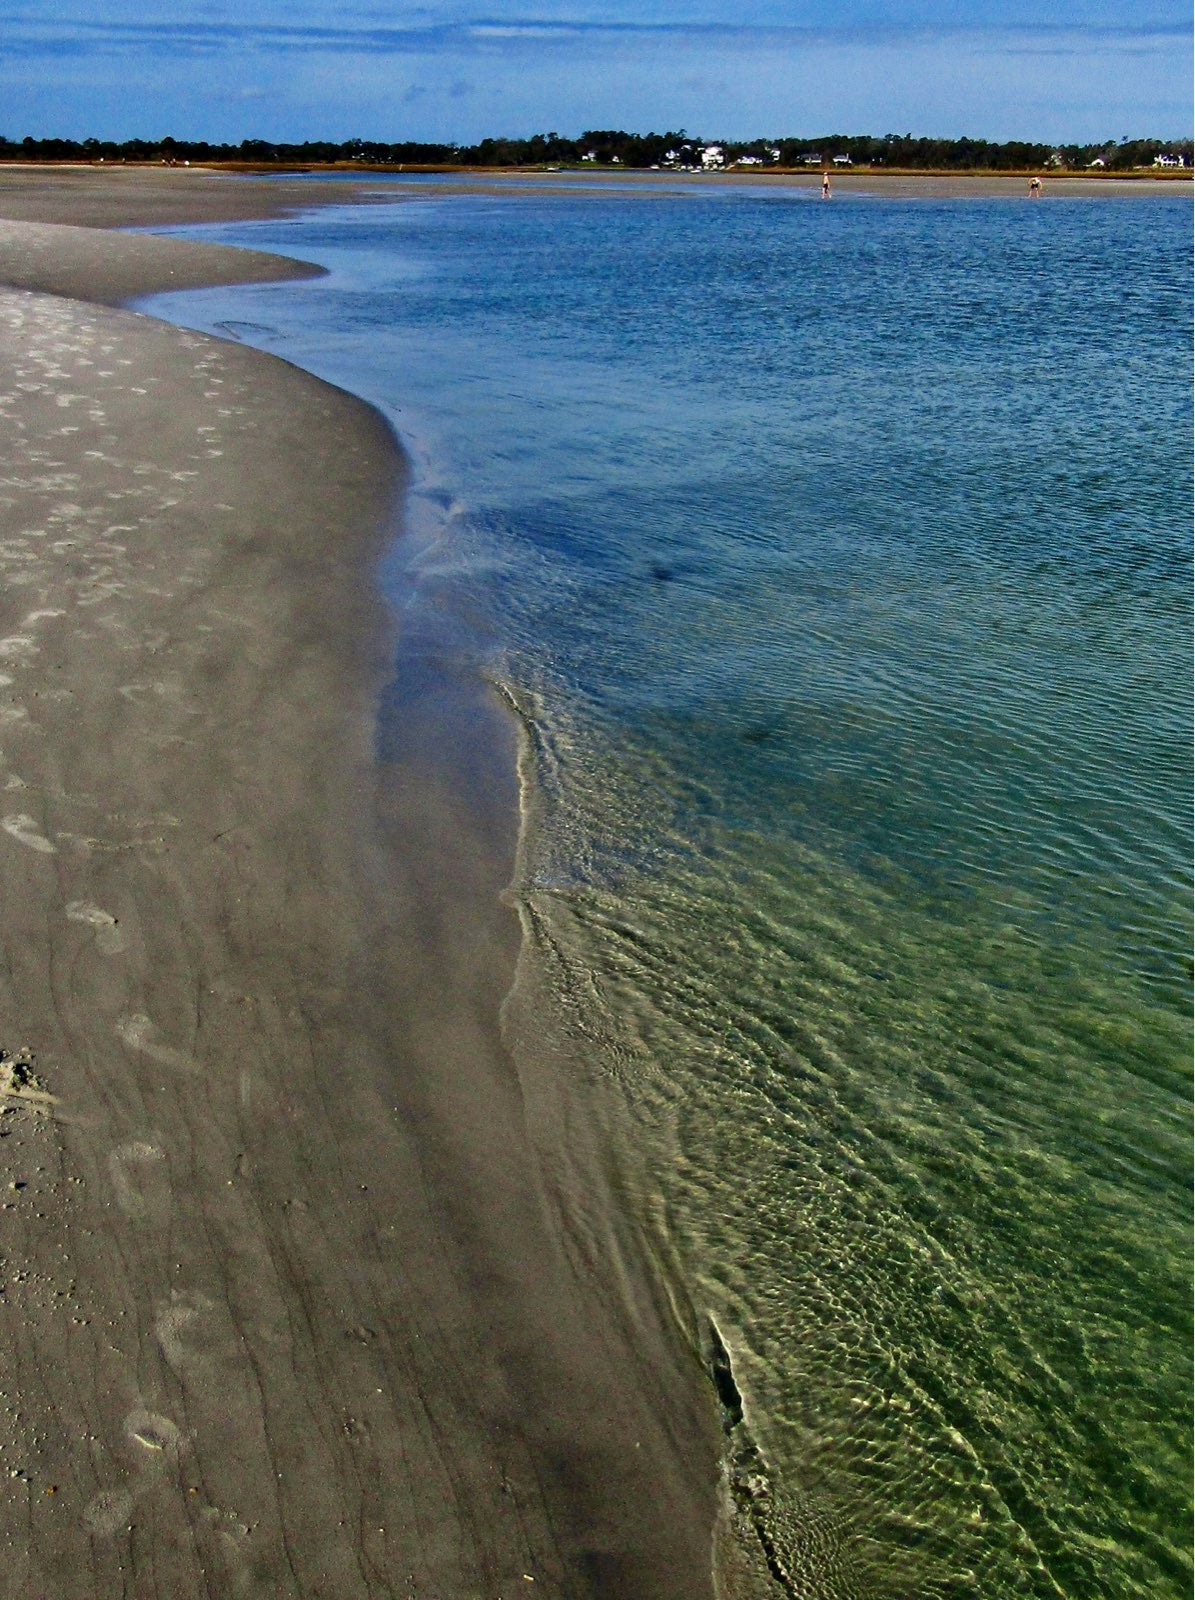 Wavy coastline photo